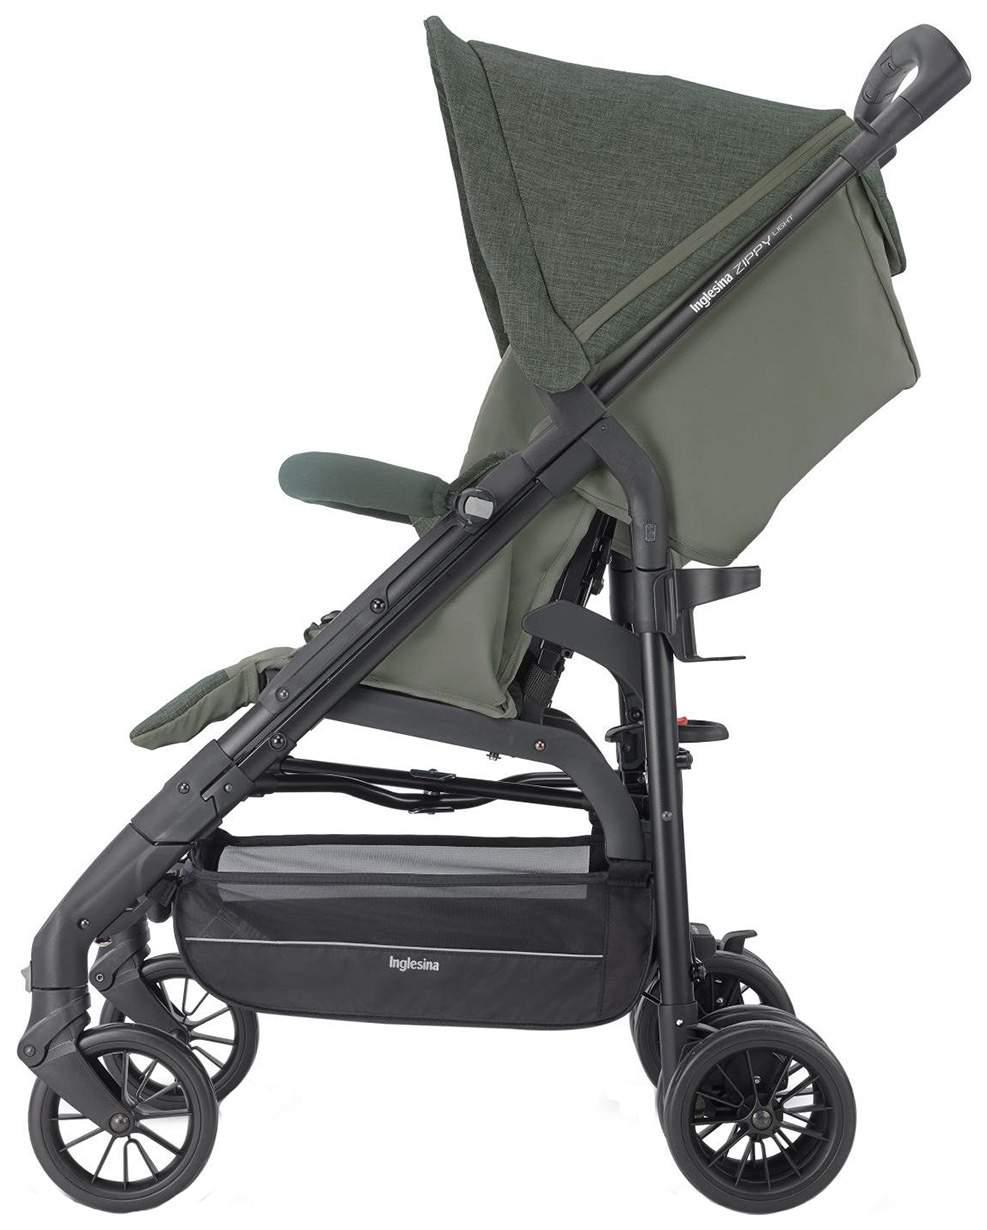 Прогулочная коляска Inglesina Zippy light Сamp green